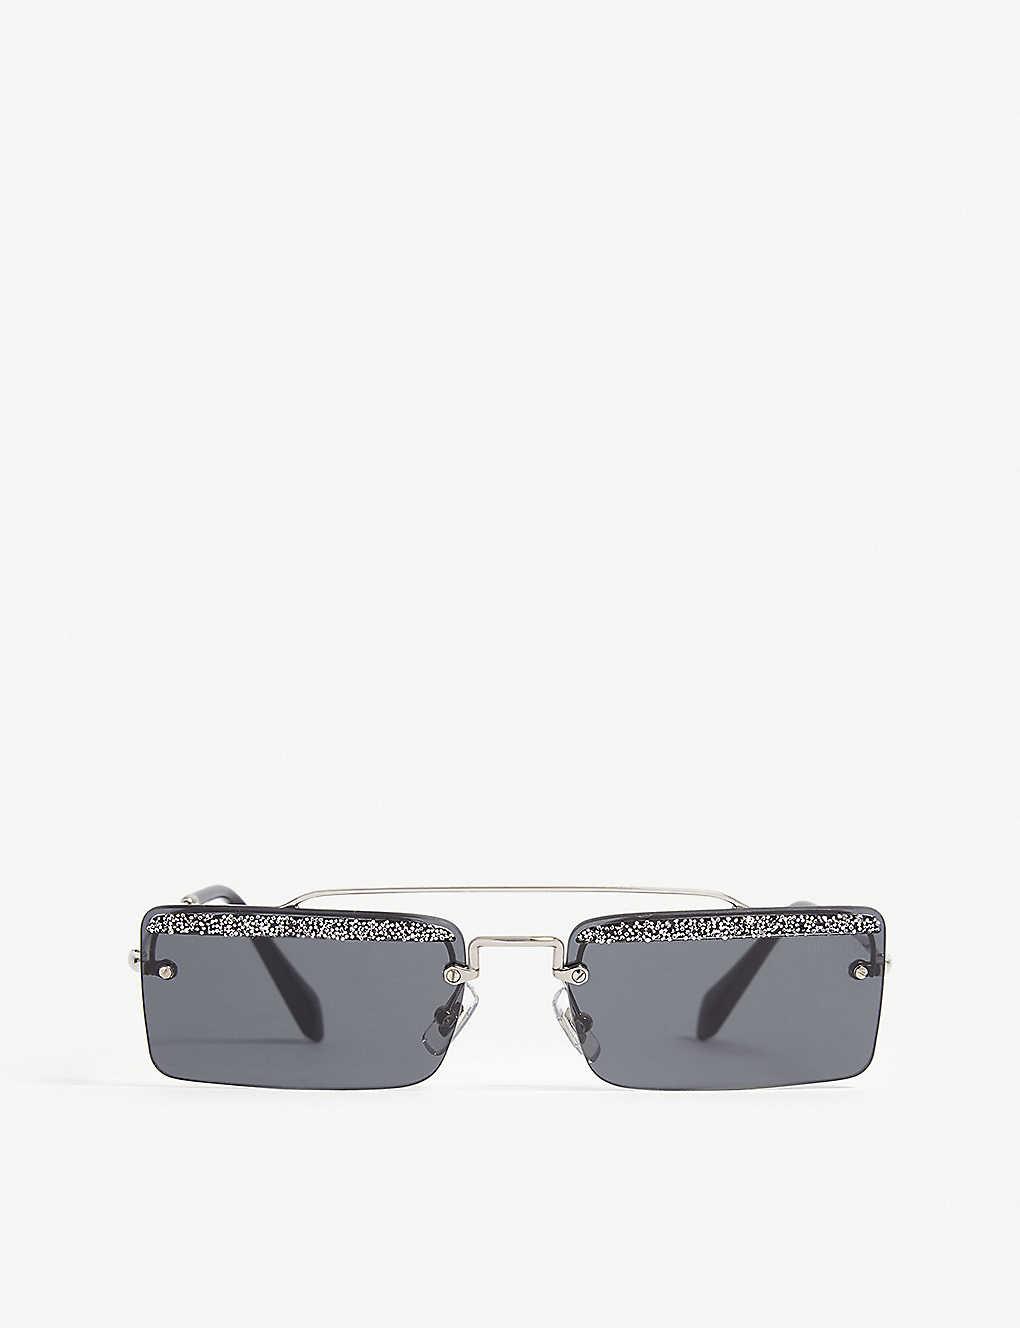 8397b4a81 MIU MIU - Mu59Ts rectangle-frame sunglasses | Selfridges.com